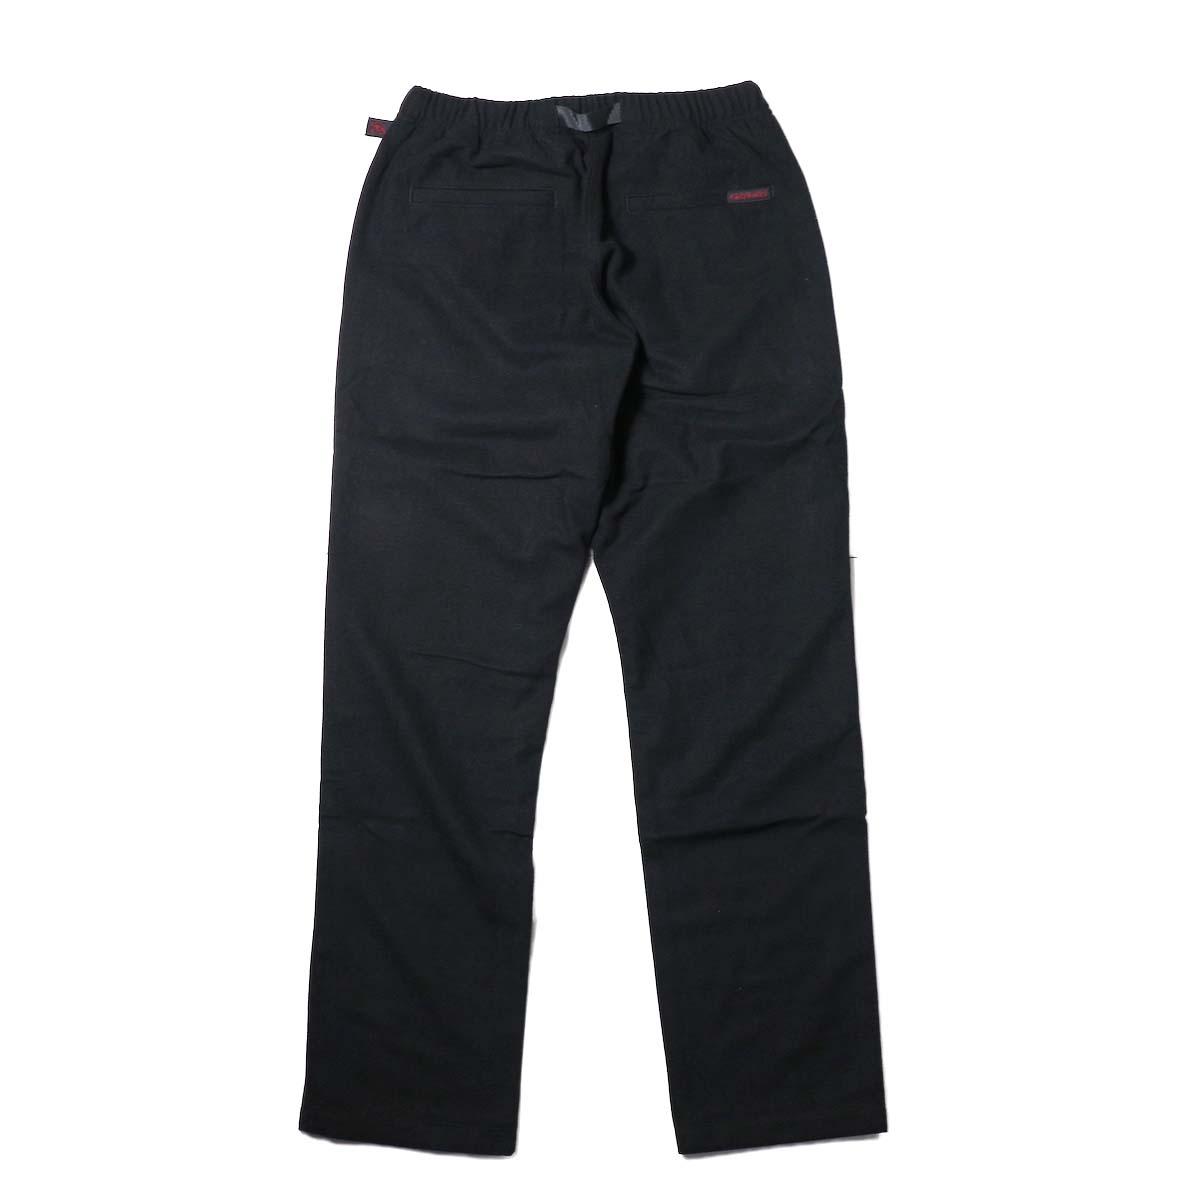 GRAMICCI / WOOL BLEND ST-PANTS (Black)背面